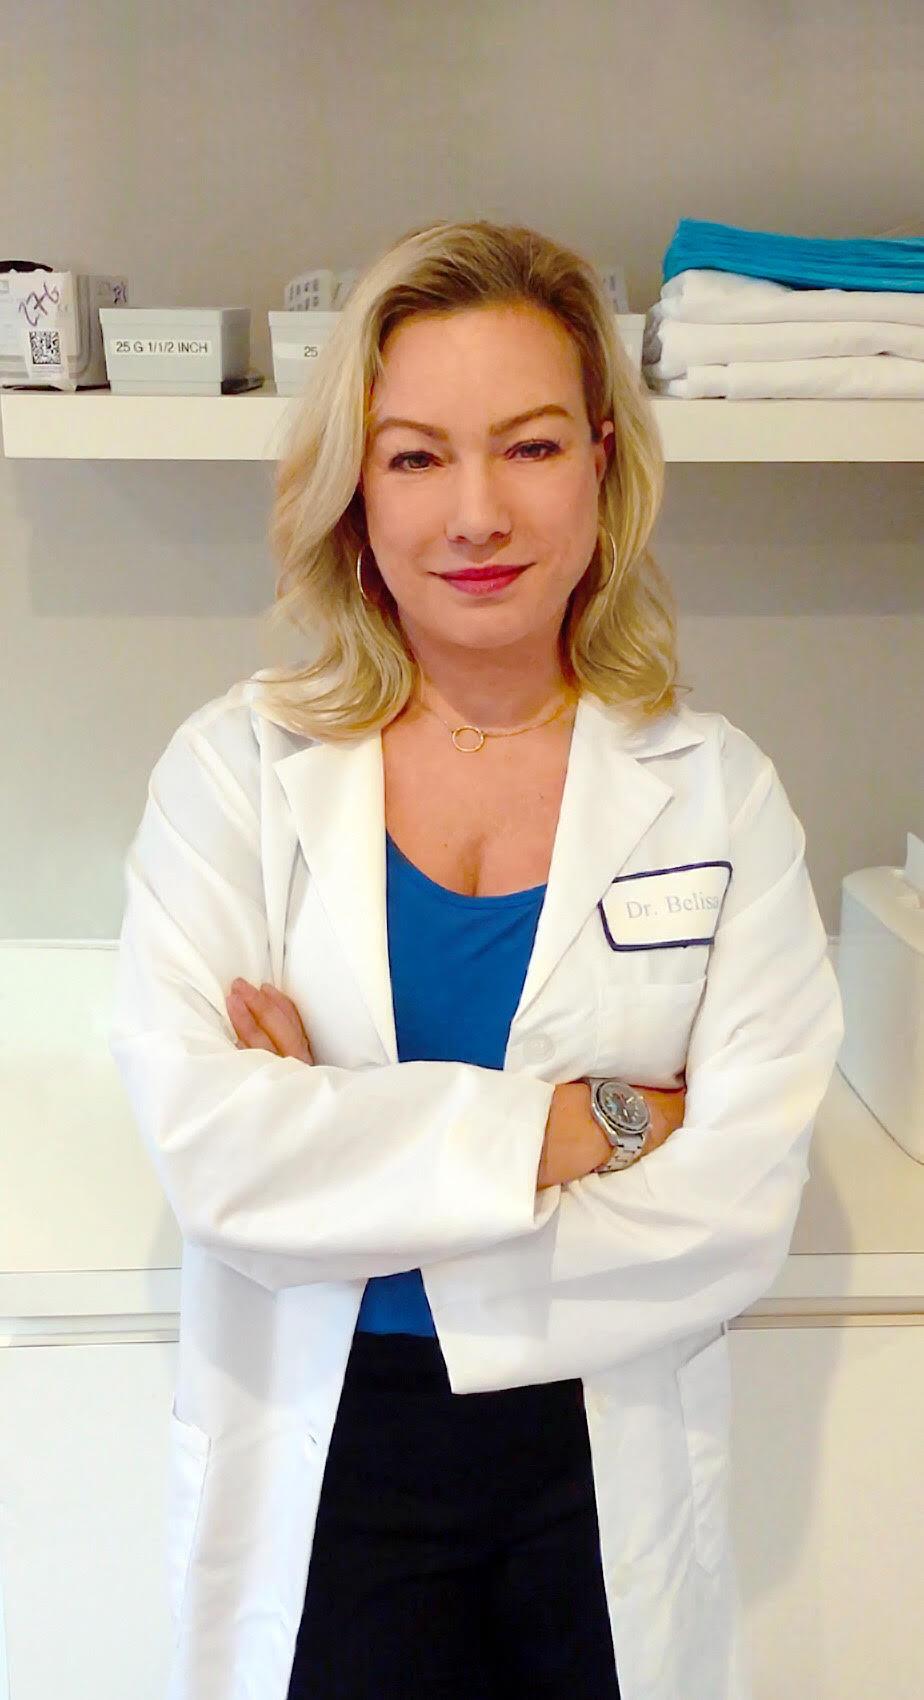 Dr. Belisa Vranich